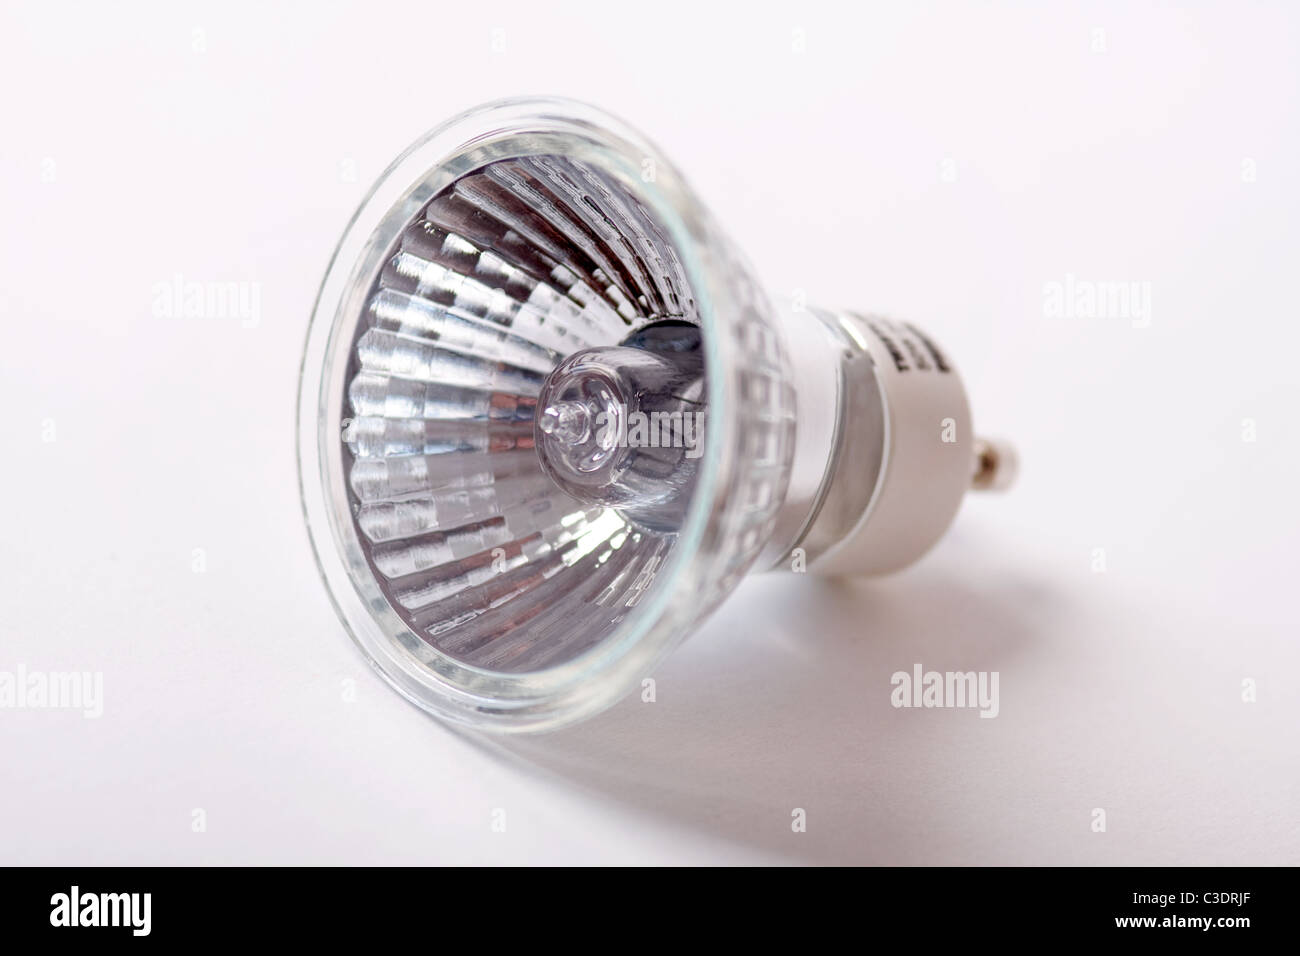 A Philips Twistline Halogen 240v 50w light bulb - Stock Image